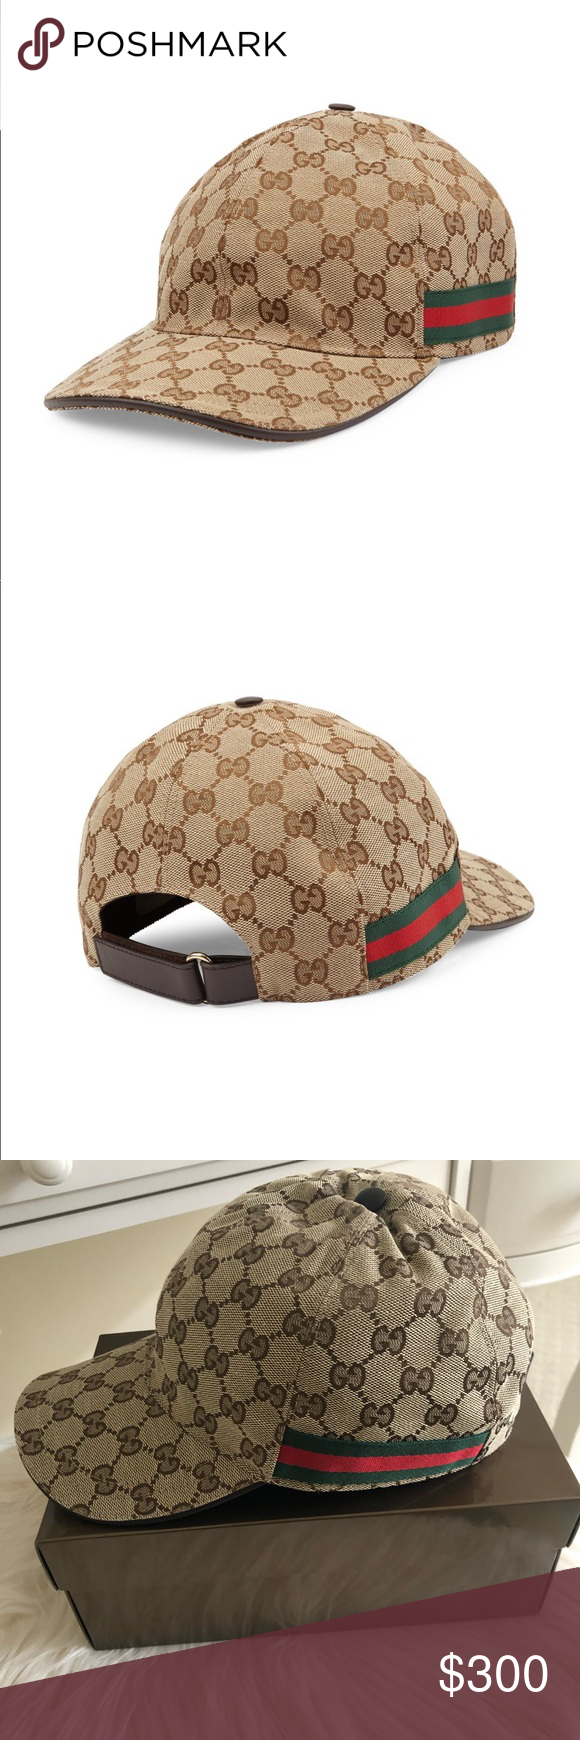 02c3a87ef6e0e NEW Gucci Canvas Baseball Hat Cap New and never worn. Comes with original  box!